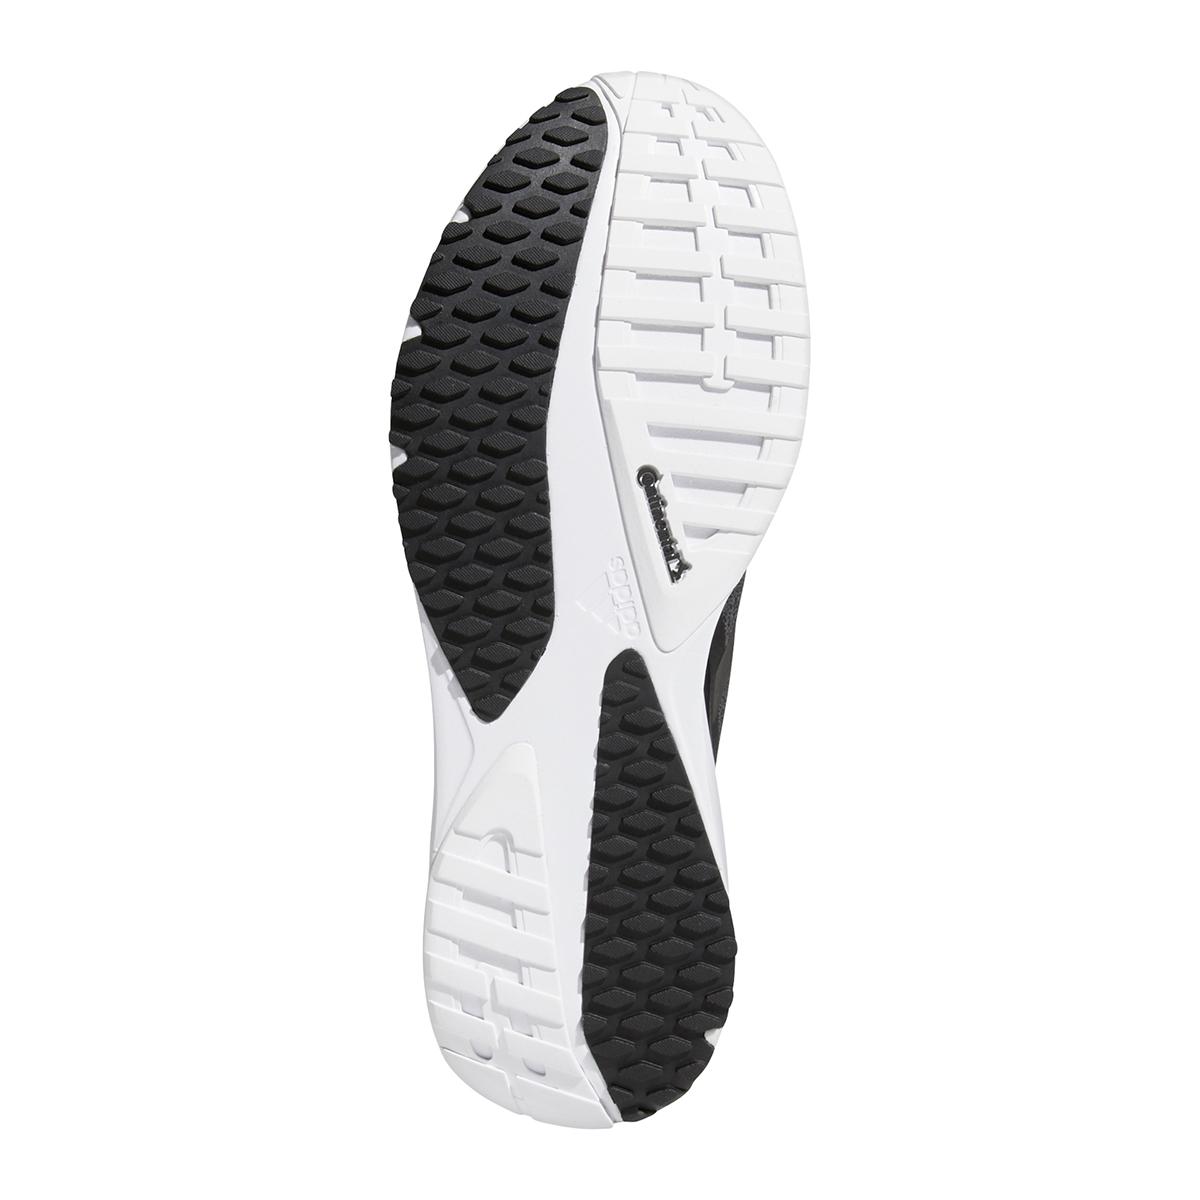 Men's Adidas SL20.2 Running Shoe - Color: Core Black/Grey - Size: 6.5 - Width: Regular, Core Black/Grey, large, image 6